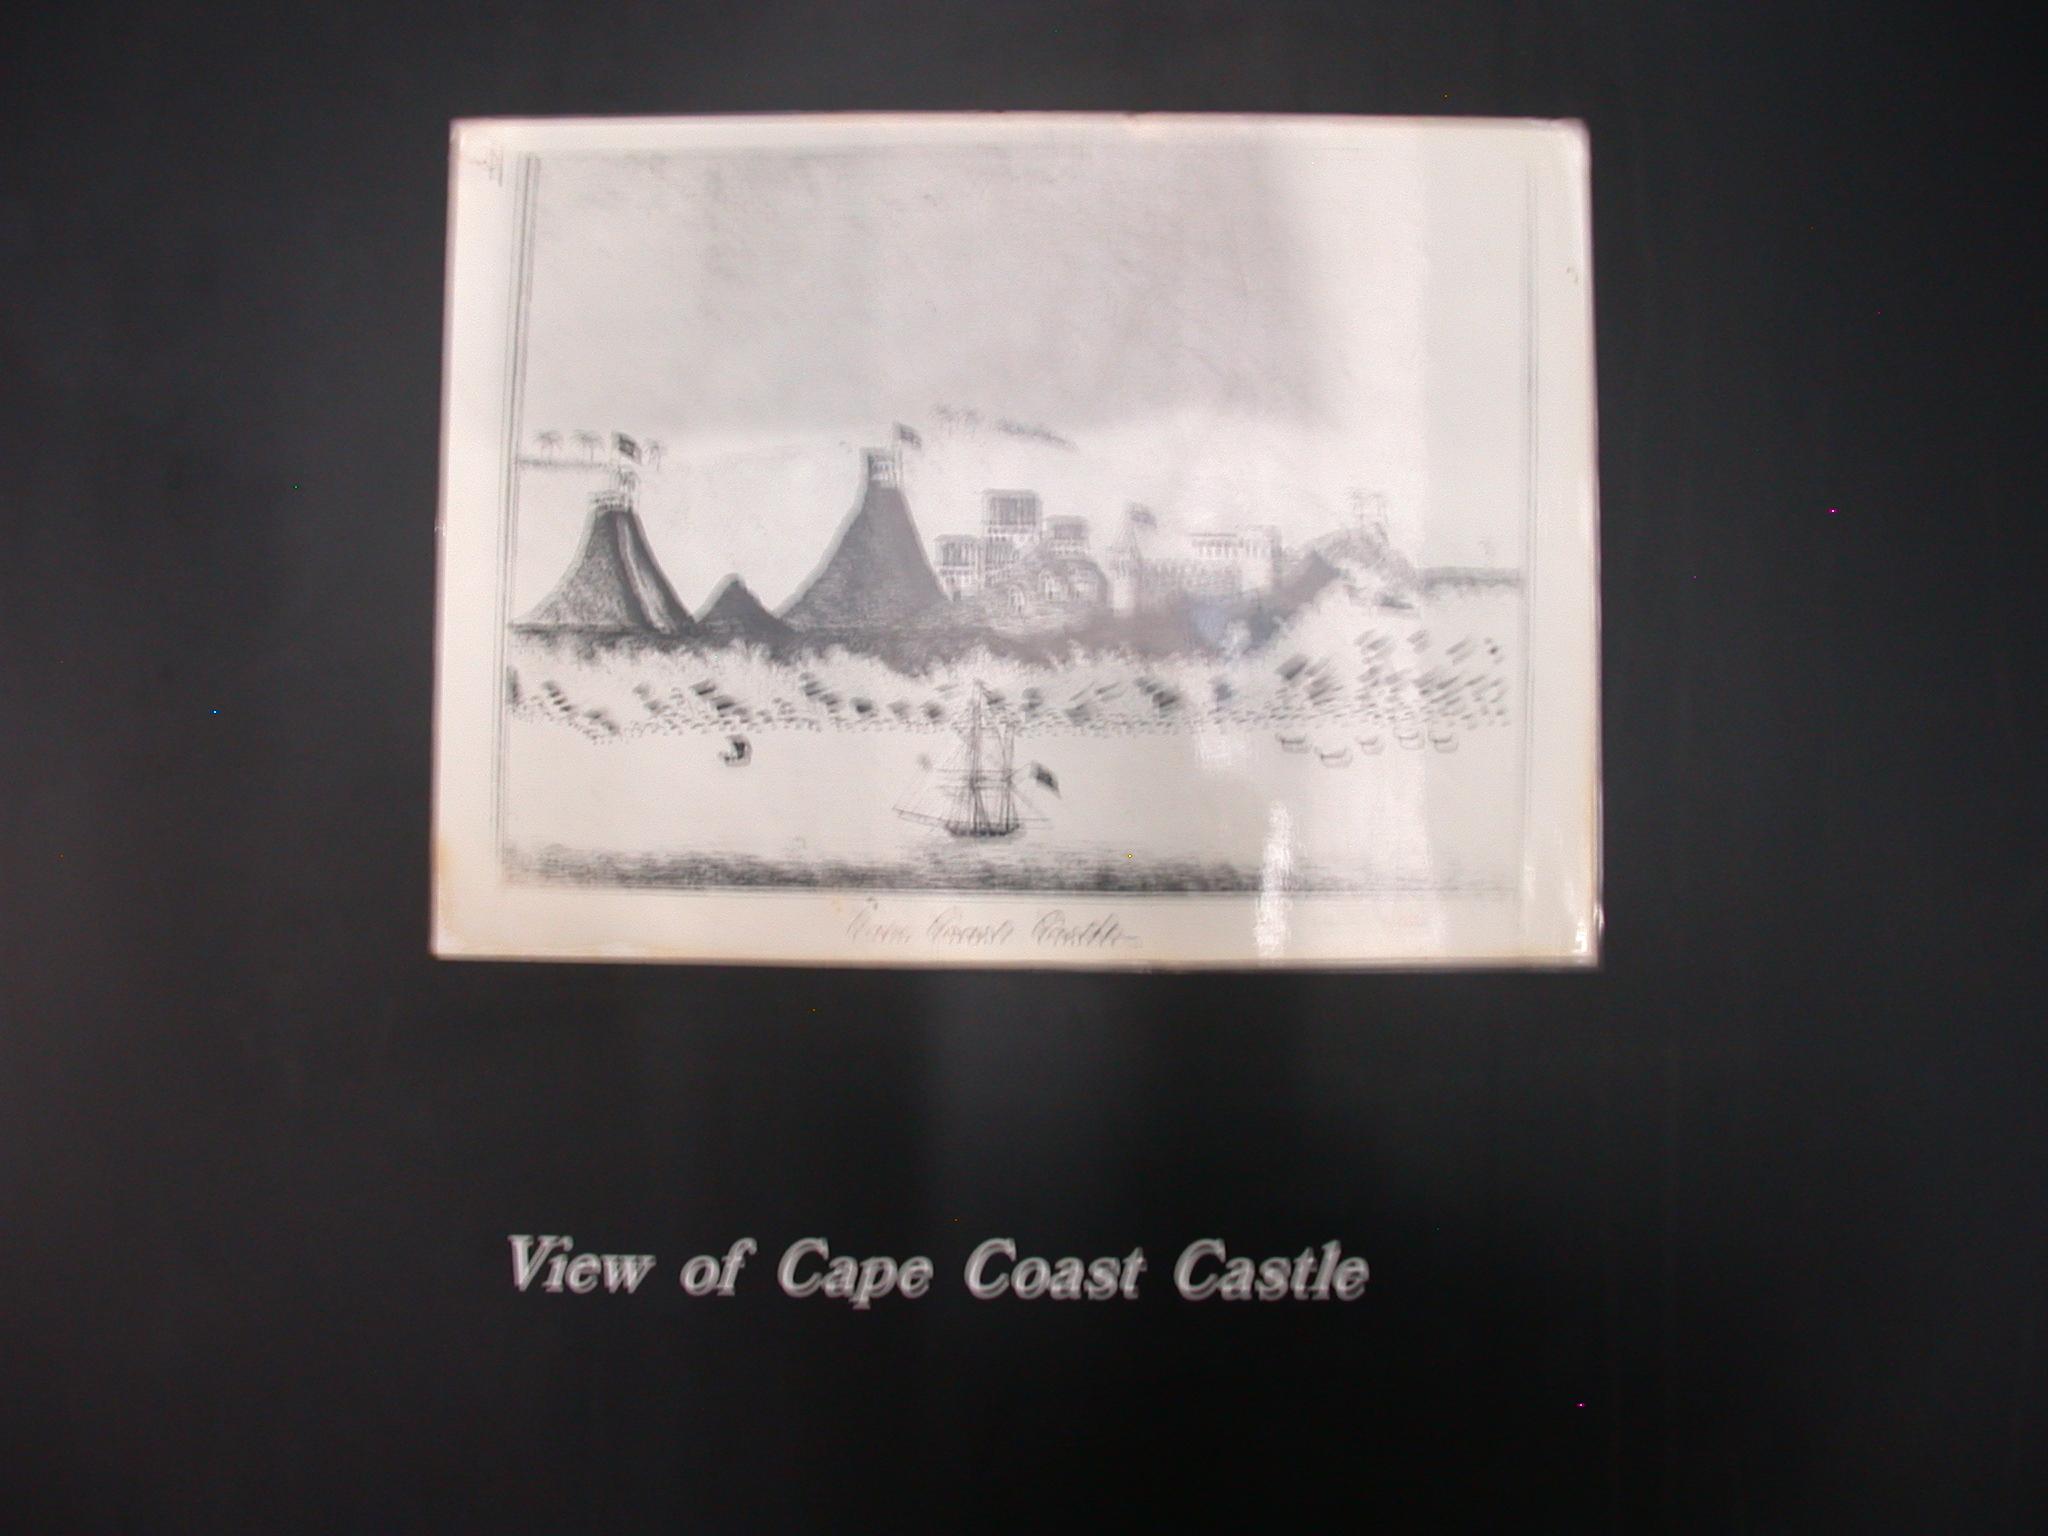 View of Cape Coast Castle, Cape Coast Slave Fort Museum, Cape Coast, Ghana